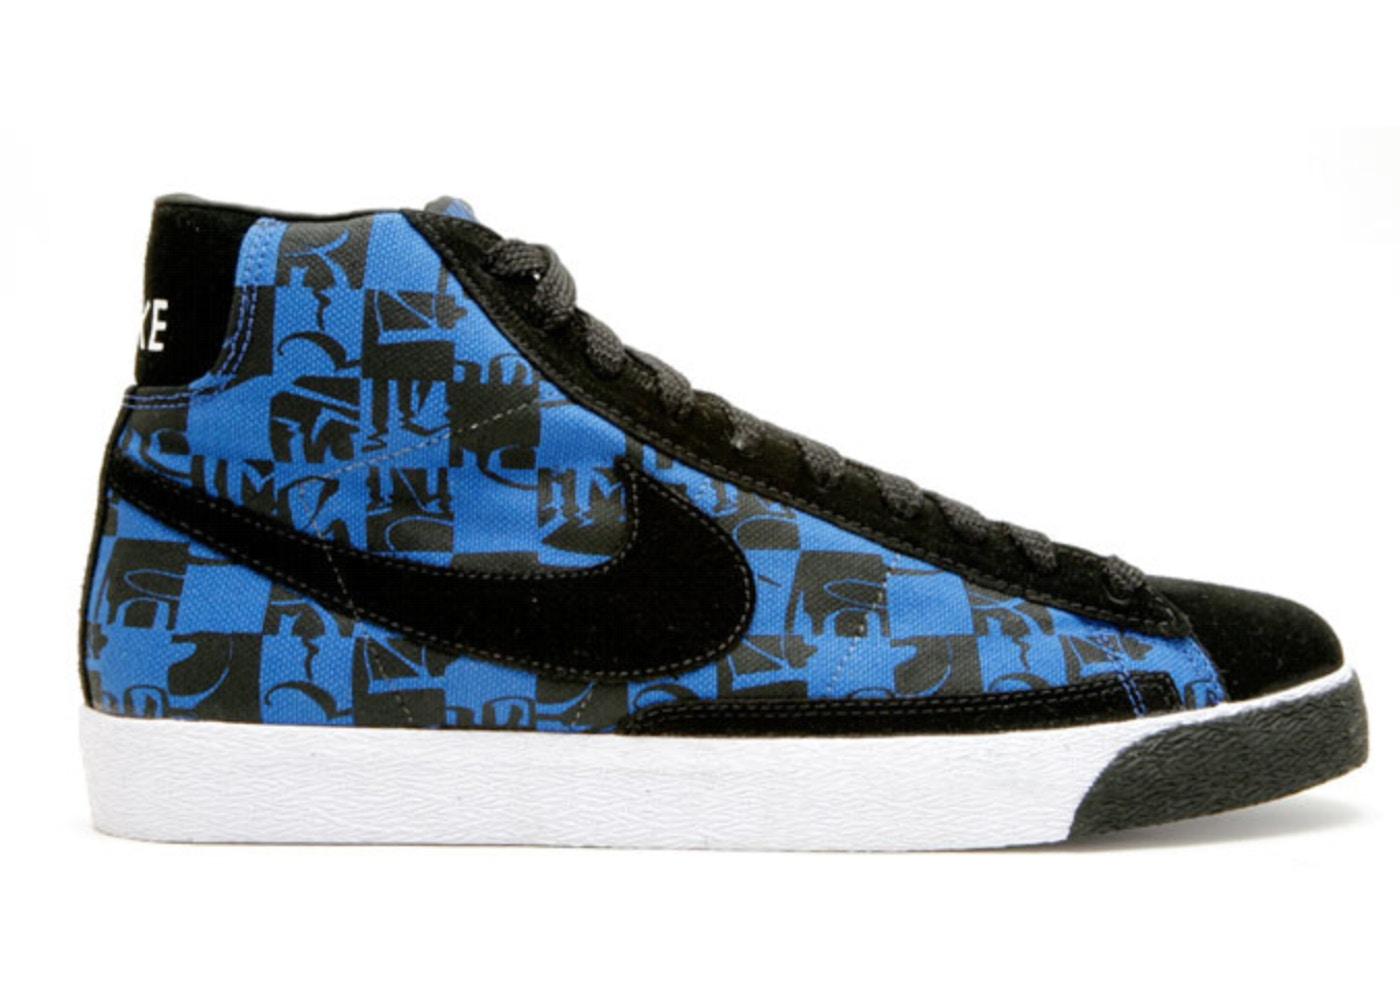 promo code 765a5 fad7a Nike SB Blazer Stussy Neighborhood Blue